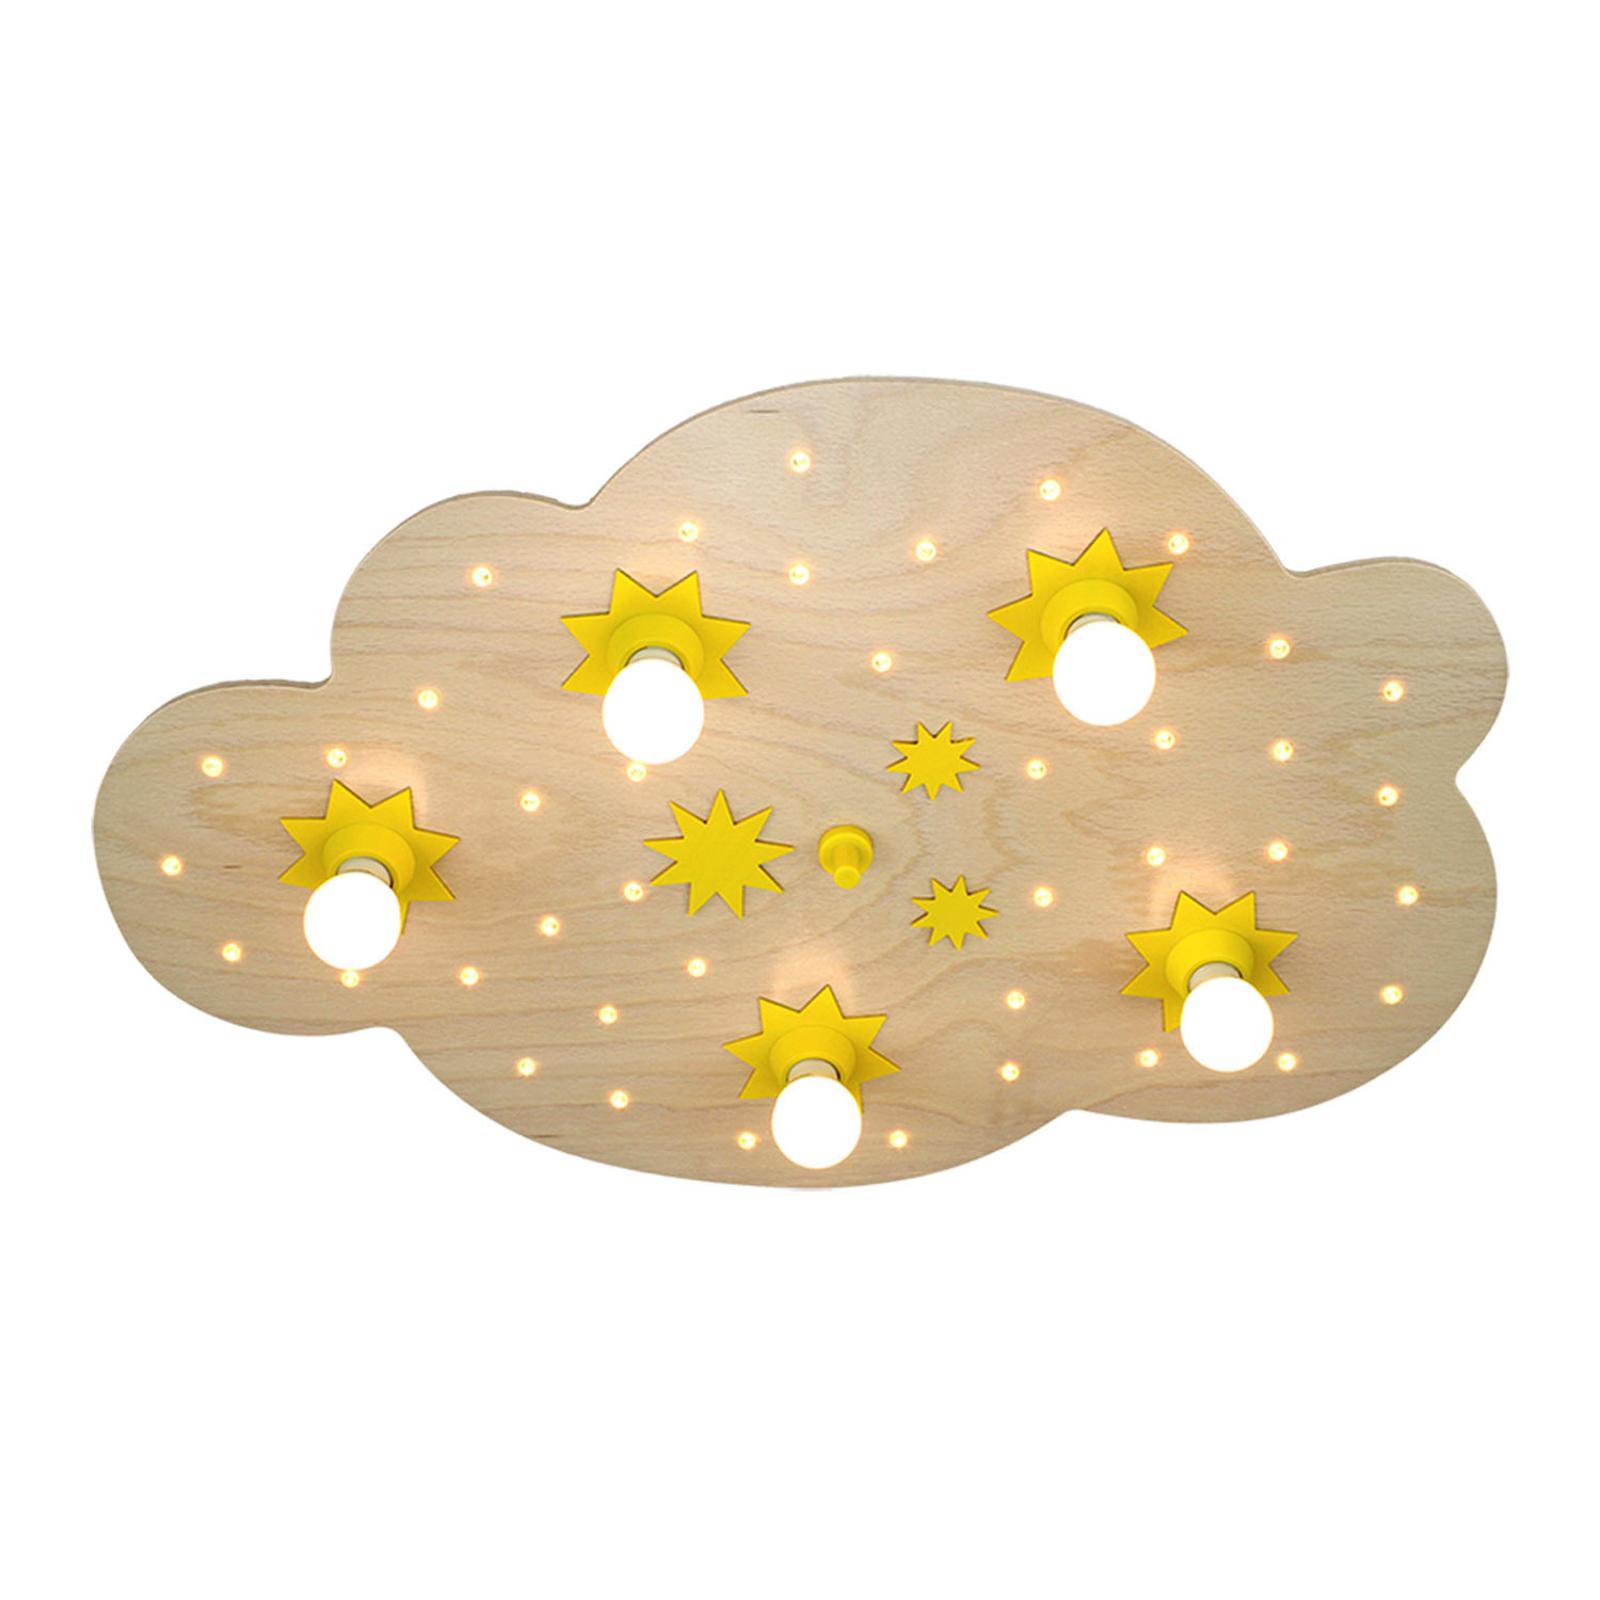 Lampa sufitowa gwiezdna chmura, buk naturalny 75cm